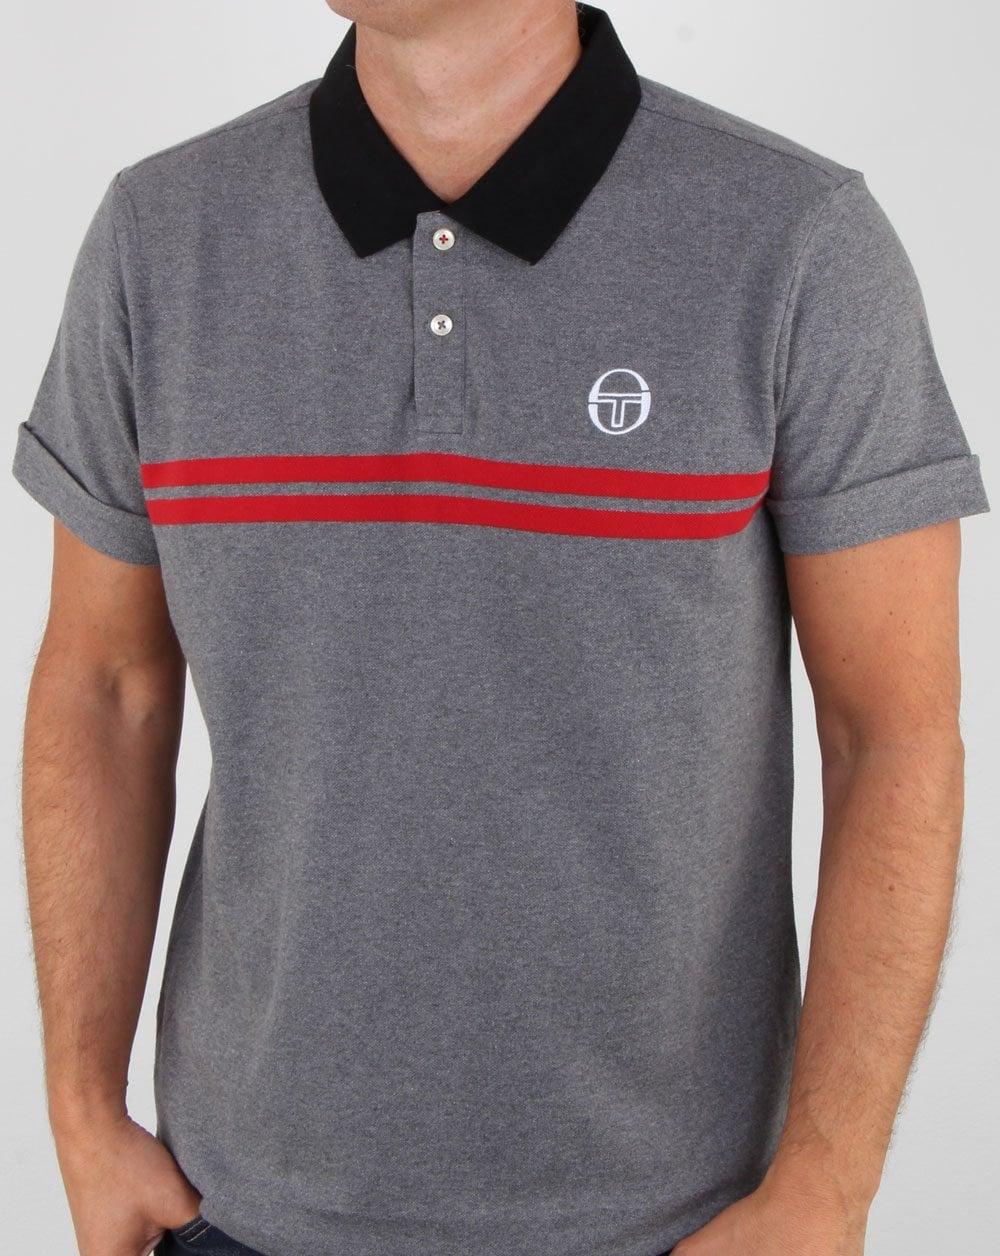 e077d762 Grey Polo Shirts Mens | Top Mode Depot